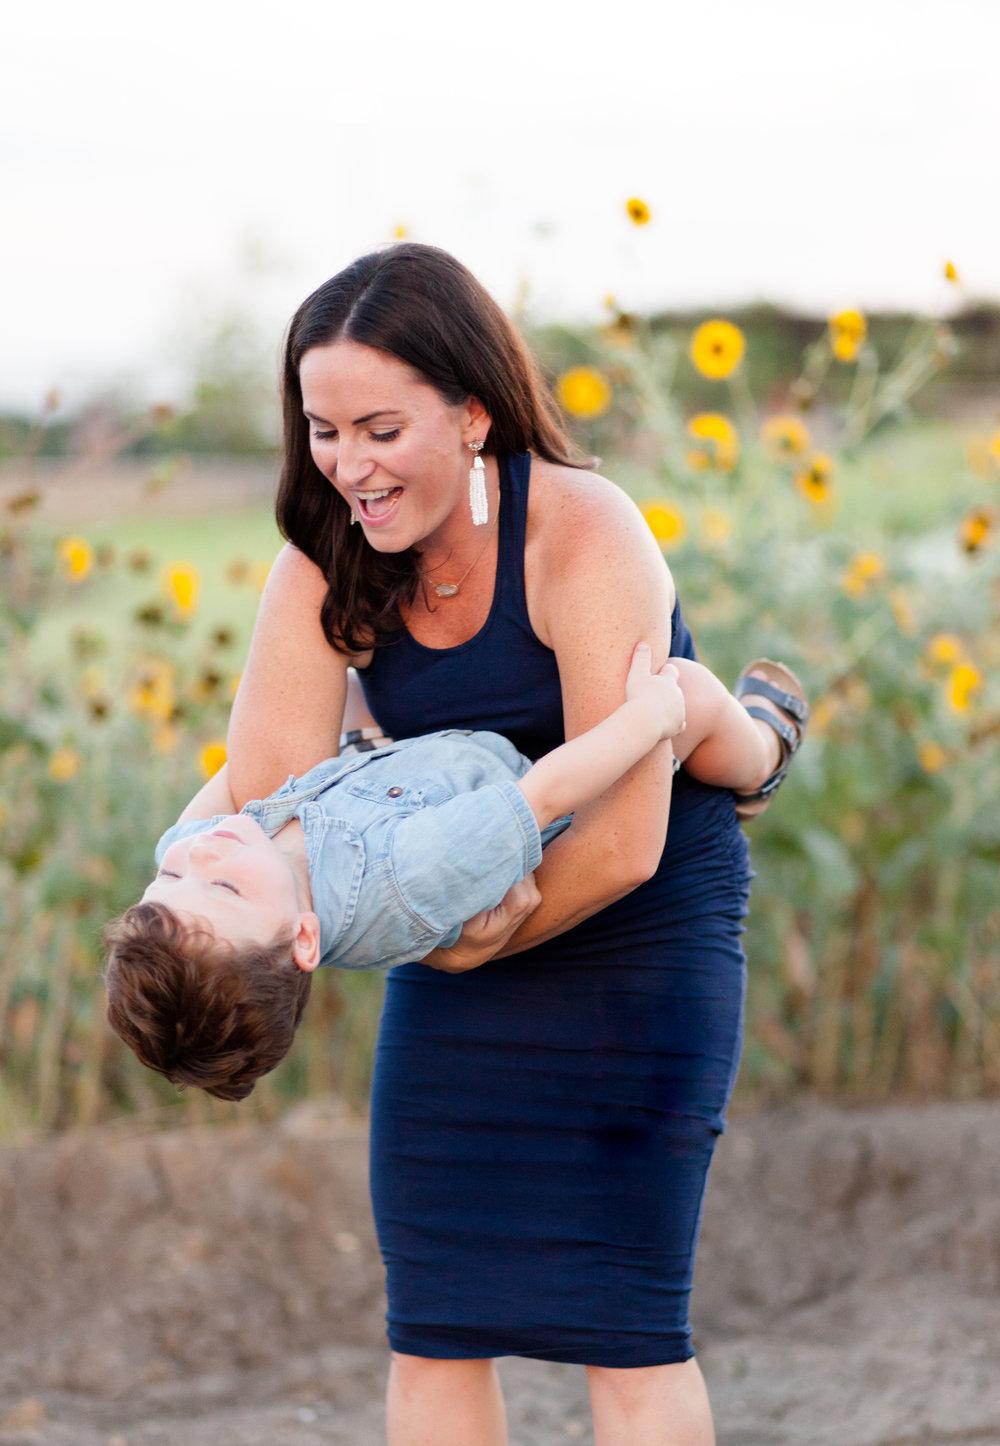 Mom and Boy candid photo